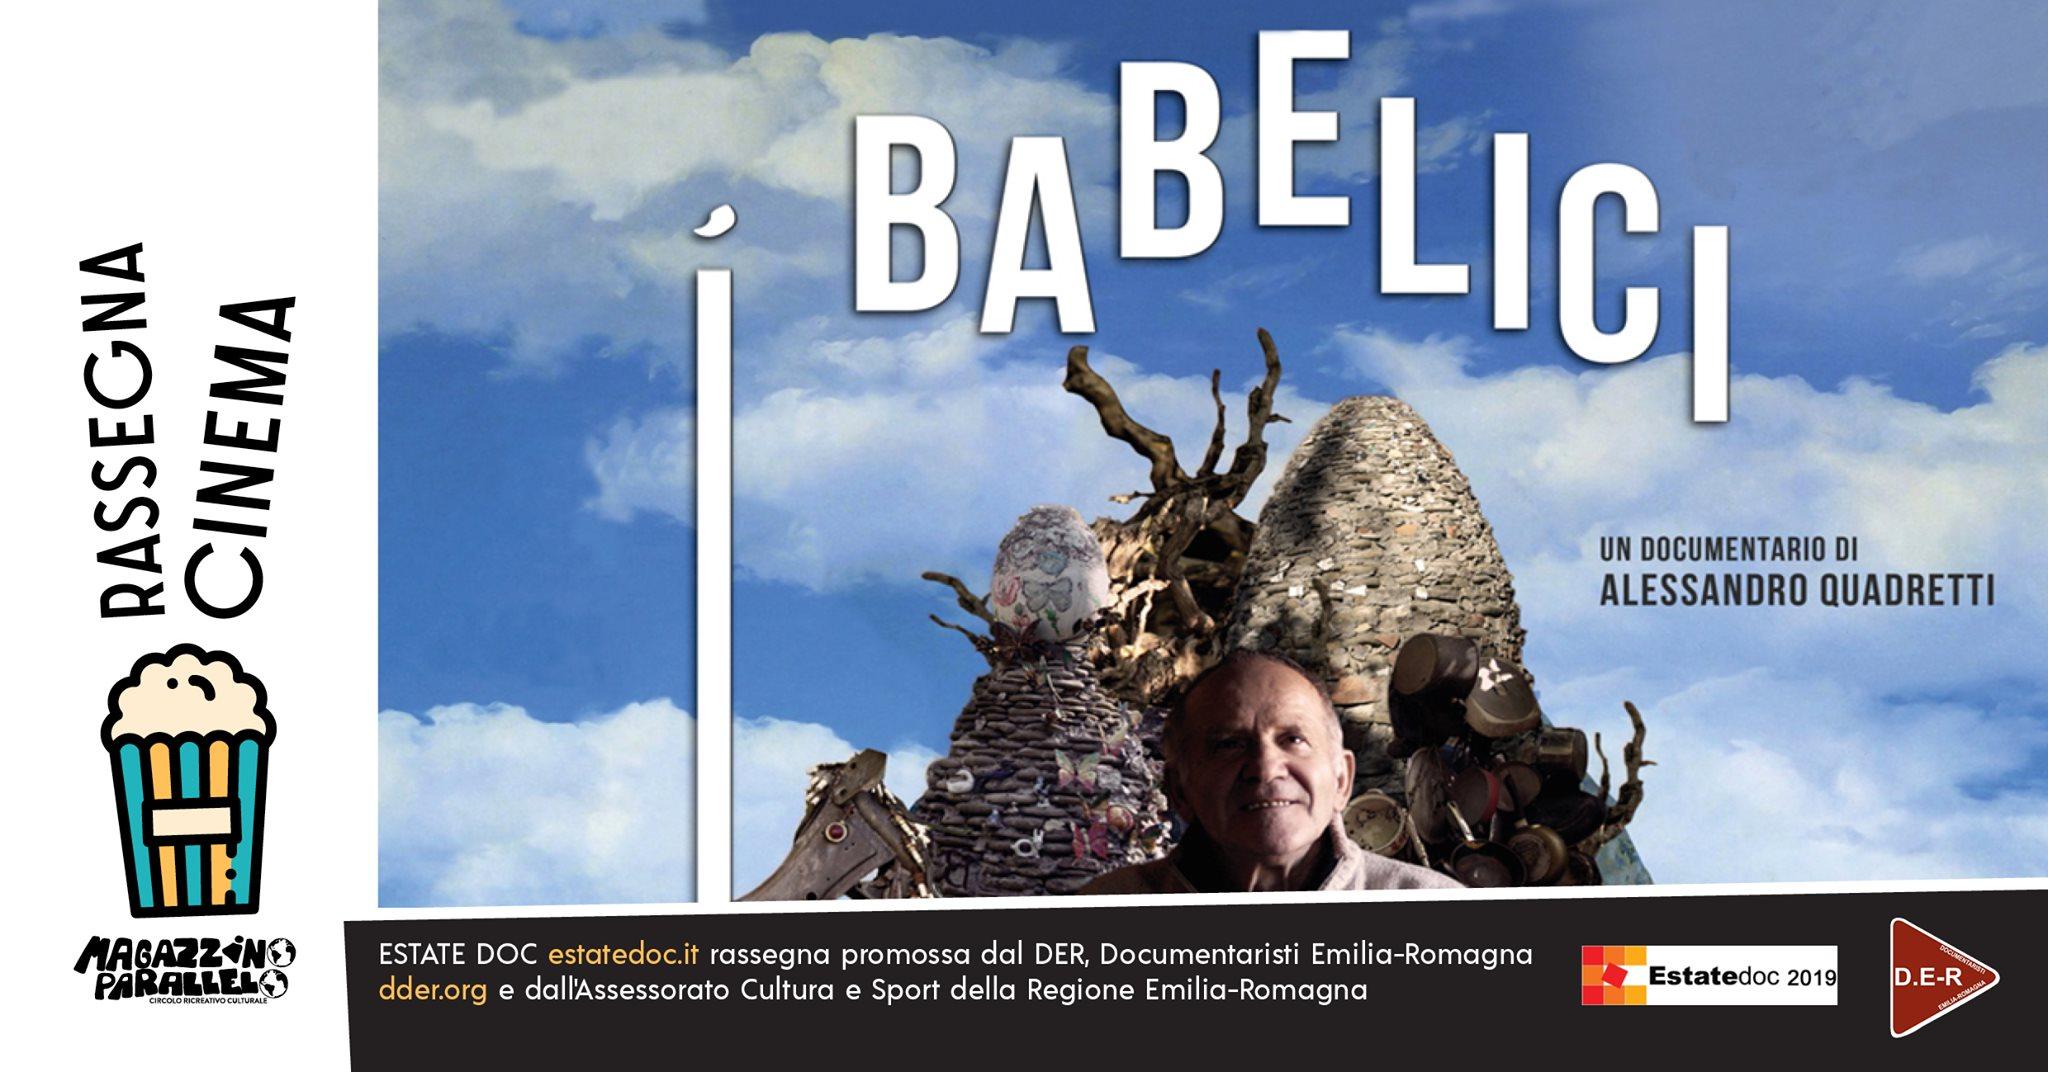 I Babelici / Rassegna Cinema at Magazzino Parallelo